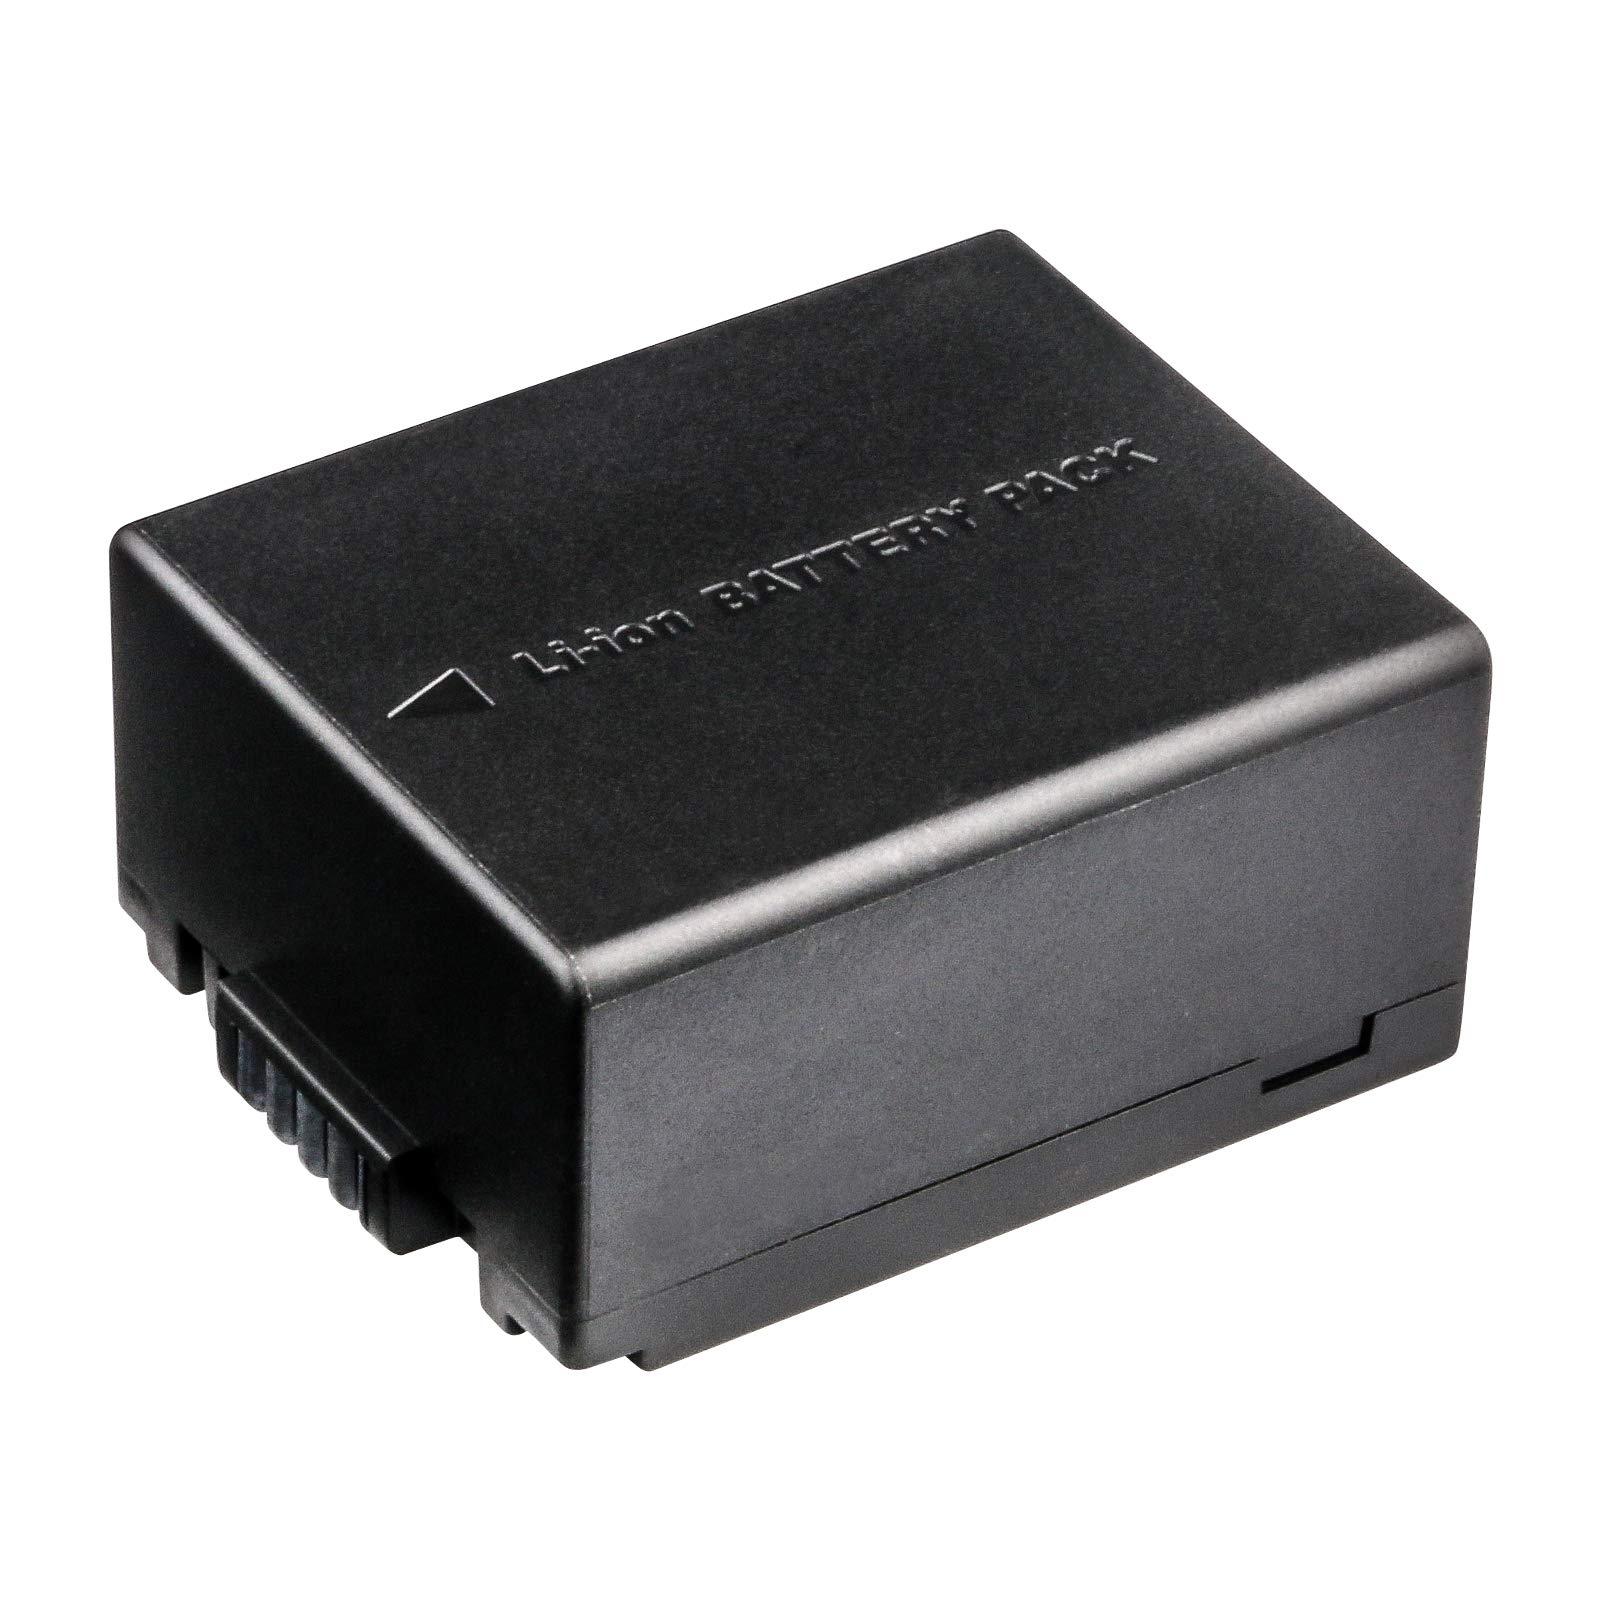 Kastar Battery Replacement for Panasonic DMW-BLB13 DMW-BLB13E DMW-BLB13PP Battery, Panasonic DE-A49 Charger and Panasonic Lumix DMC-G1 DMC-G2 DMC-G10 DMC-G10K DMC-GF1 DMC-GH1 Camera